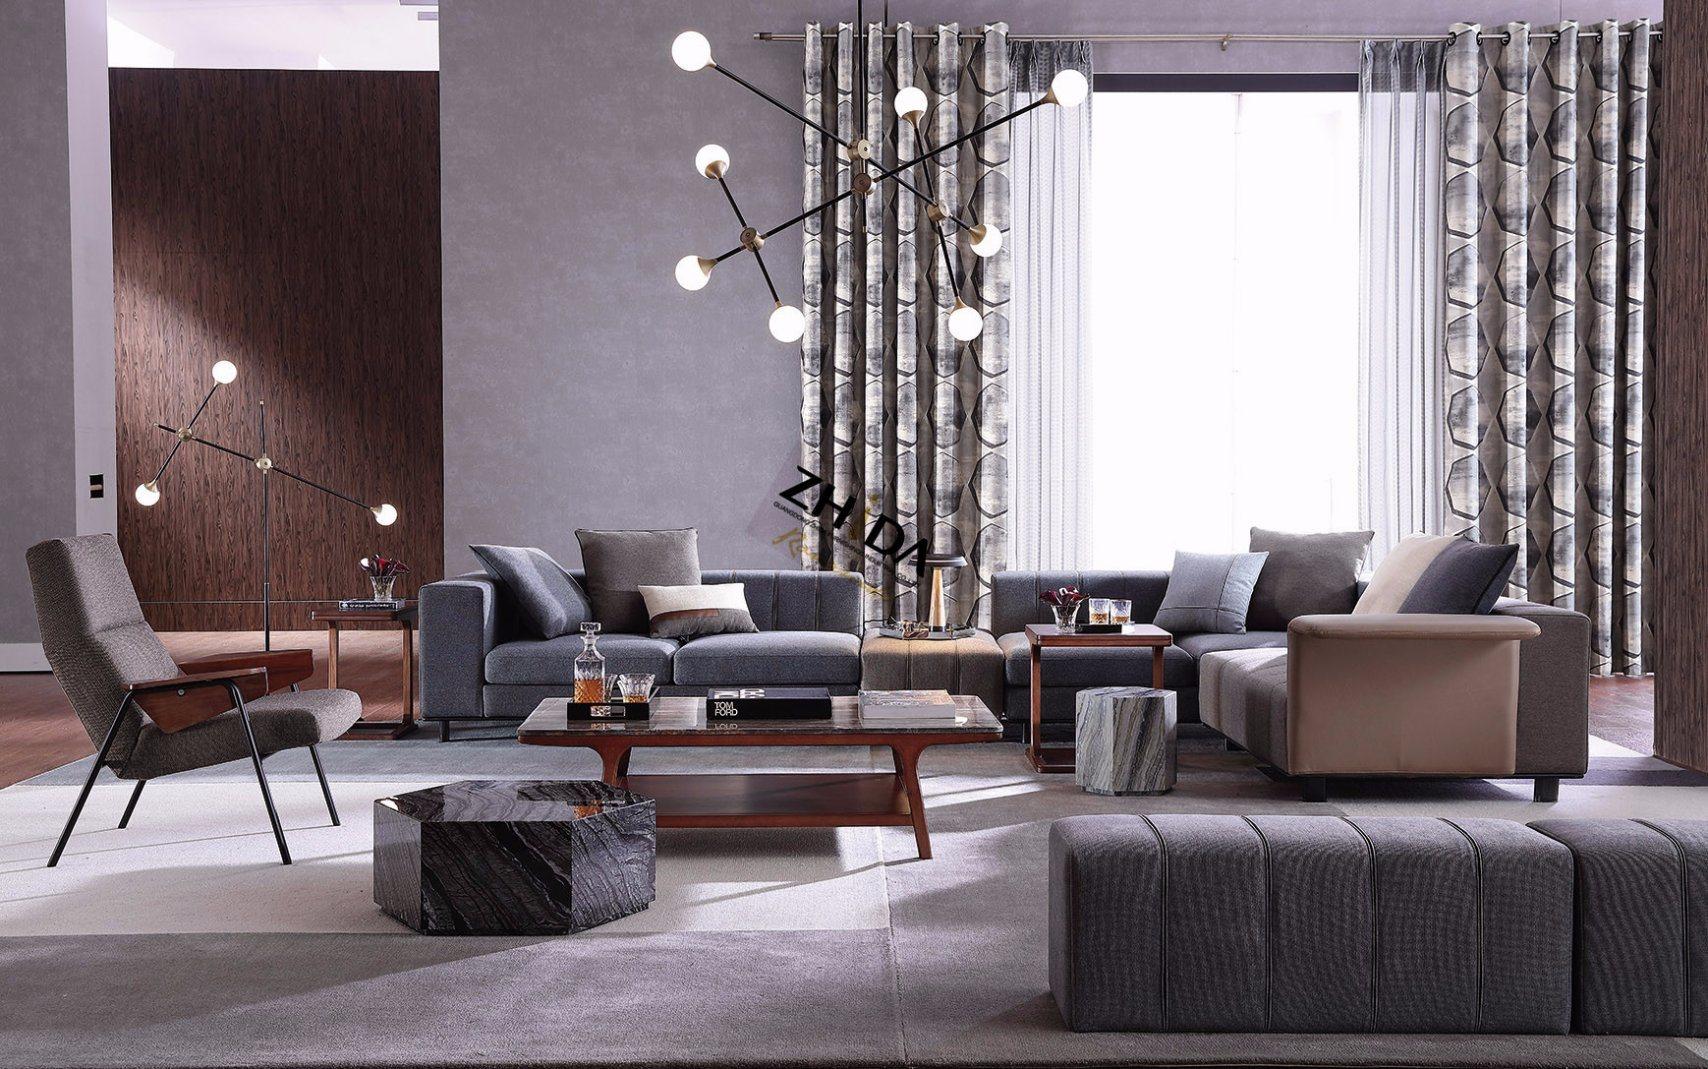 Best Selling Modern Home Living Room Furniture (Zhida)